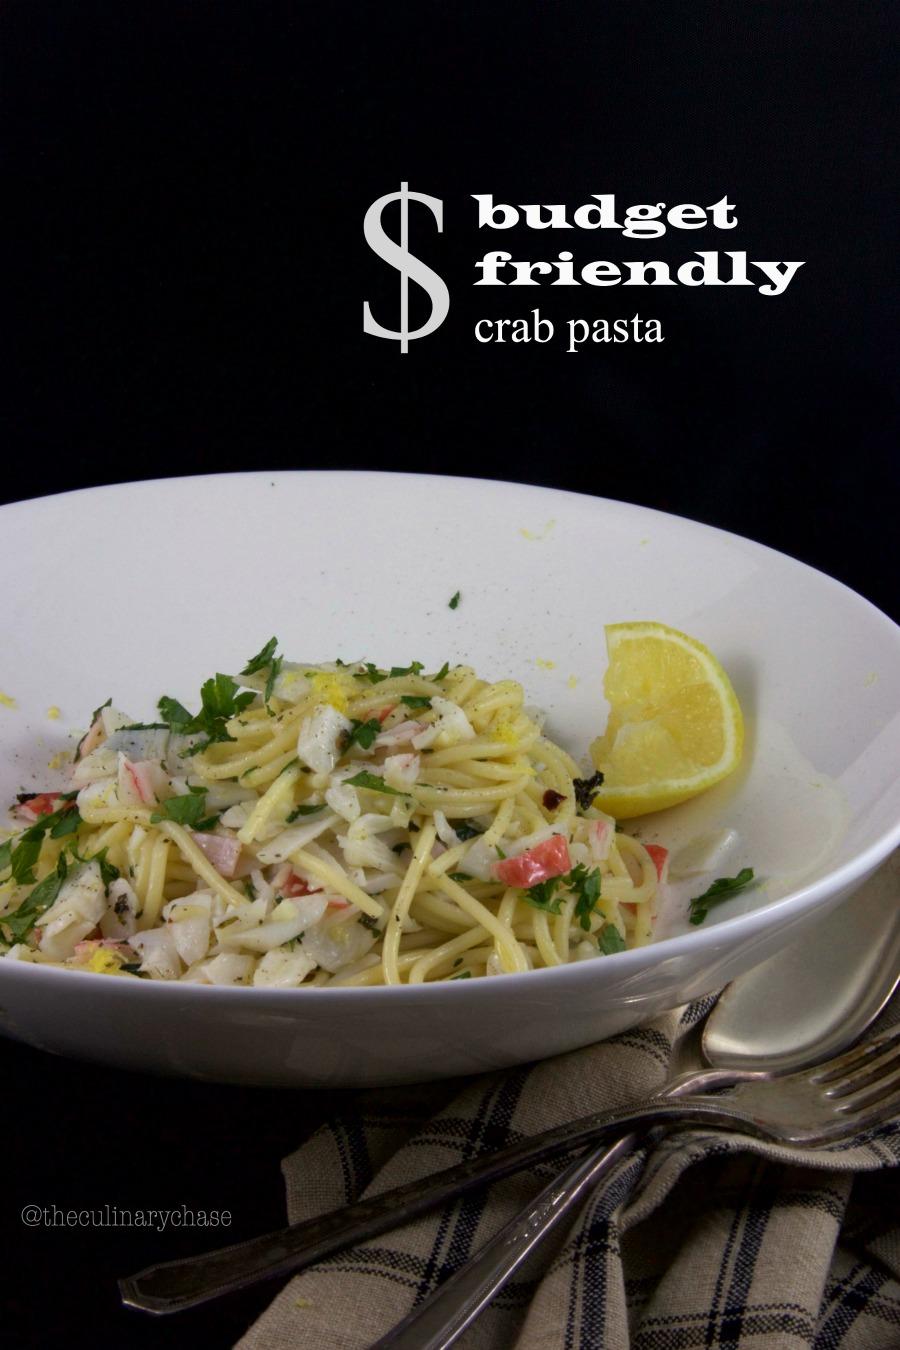 budget friendly crab pasta